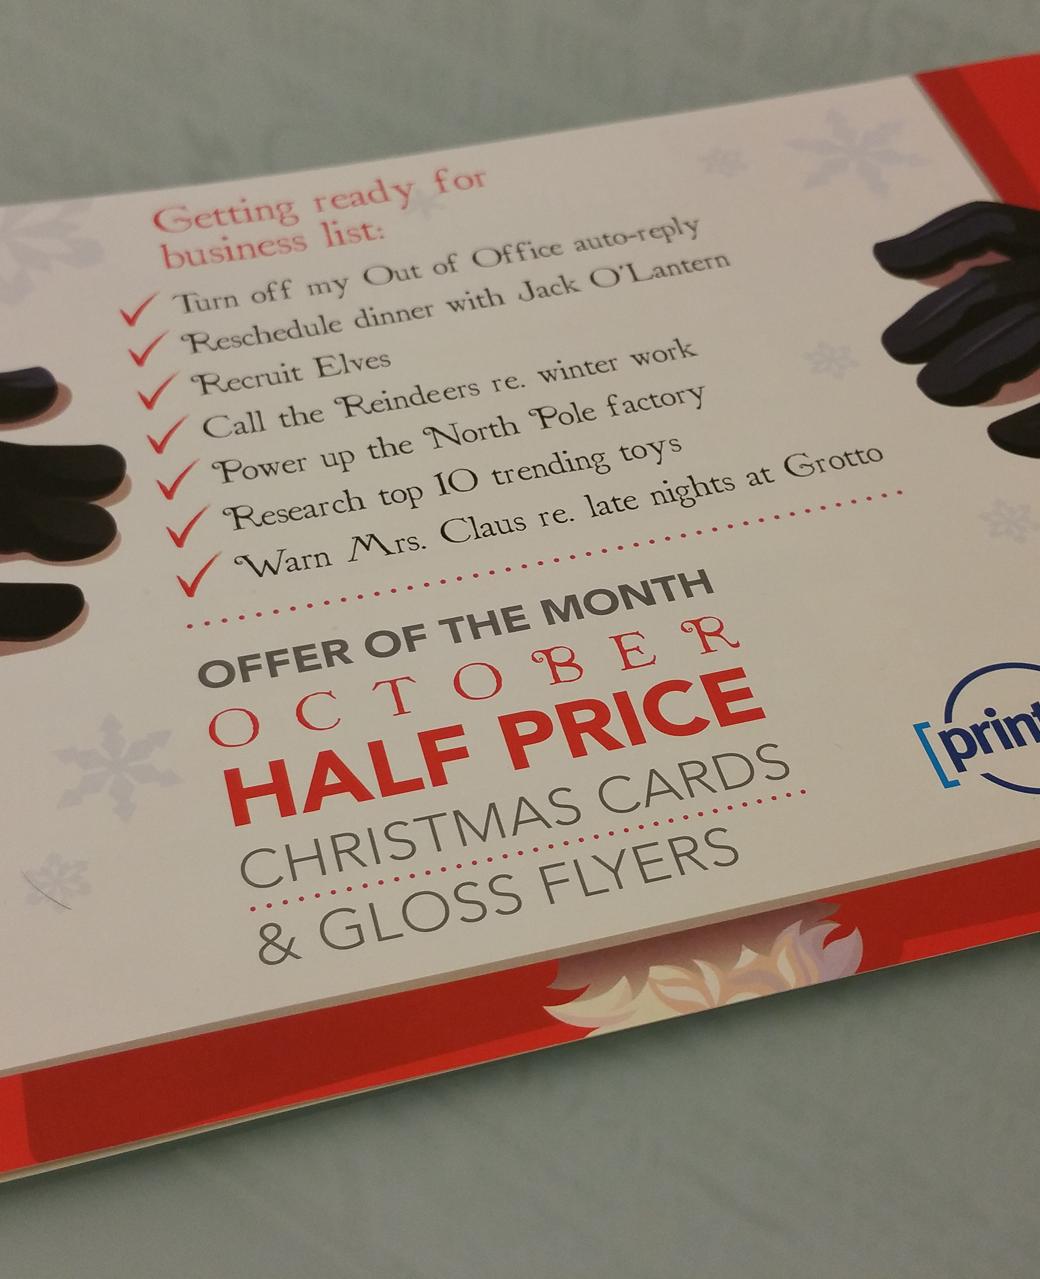 Half Price Print Offers